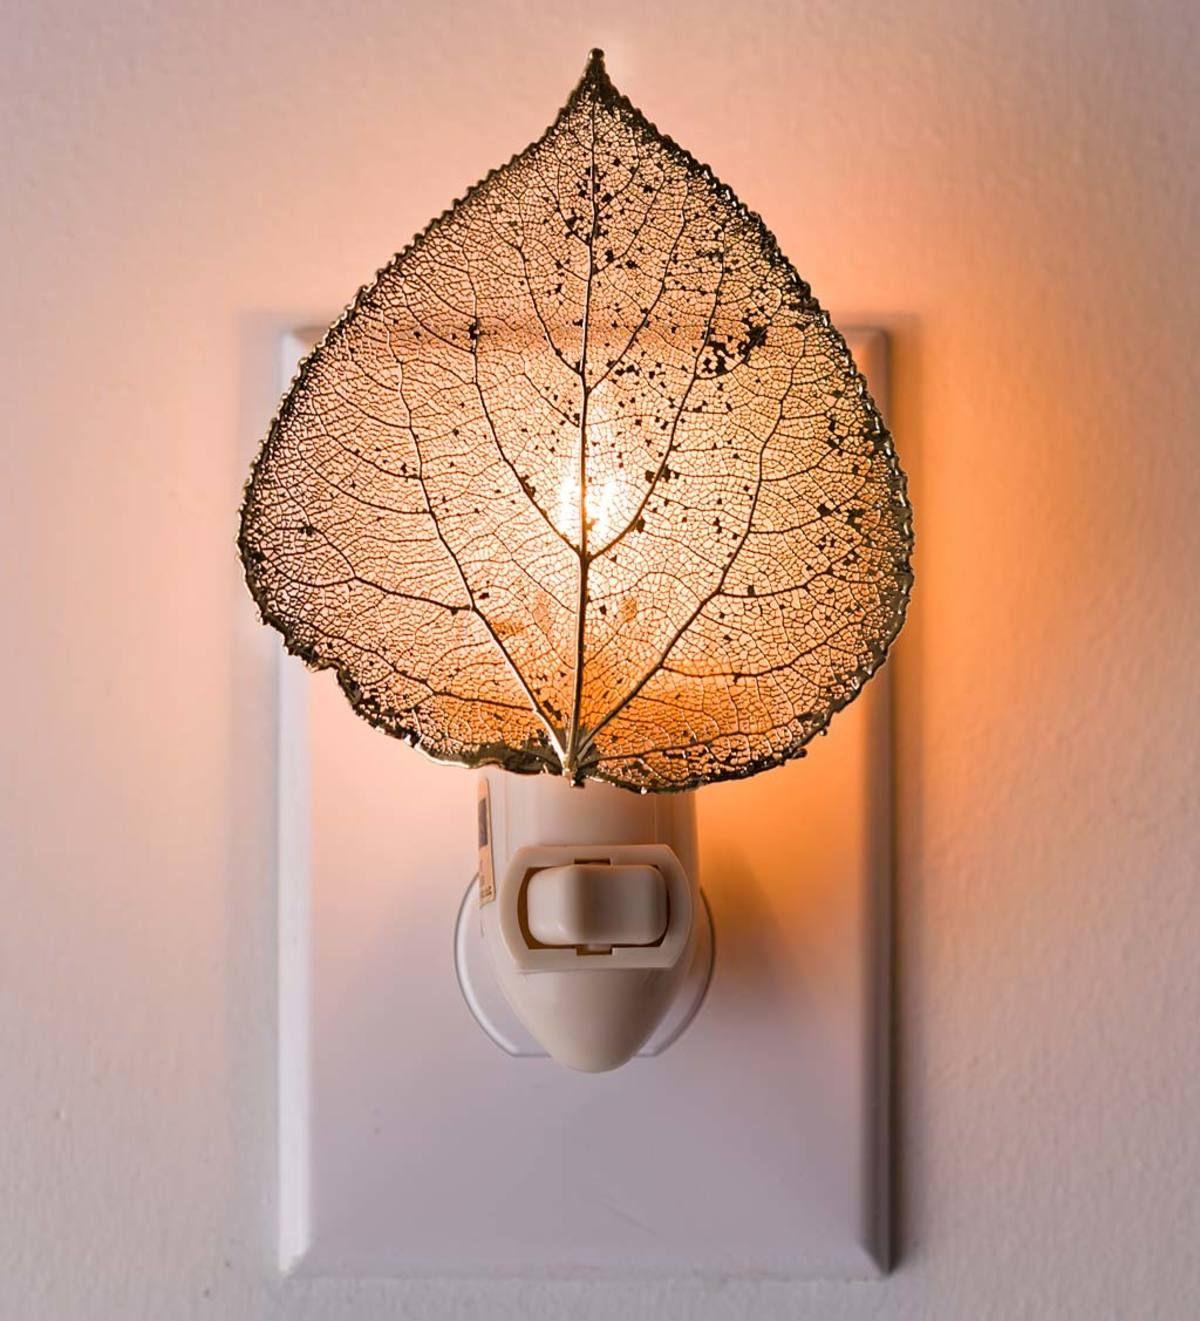 Null Night Light Night Light Lamp Aspen Leaf